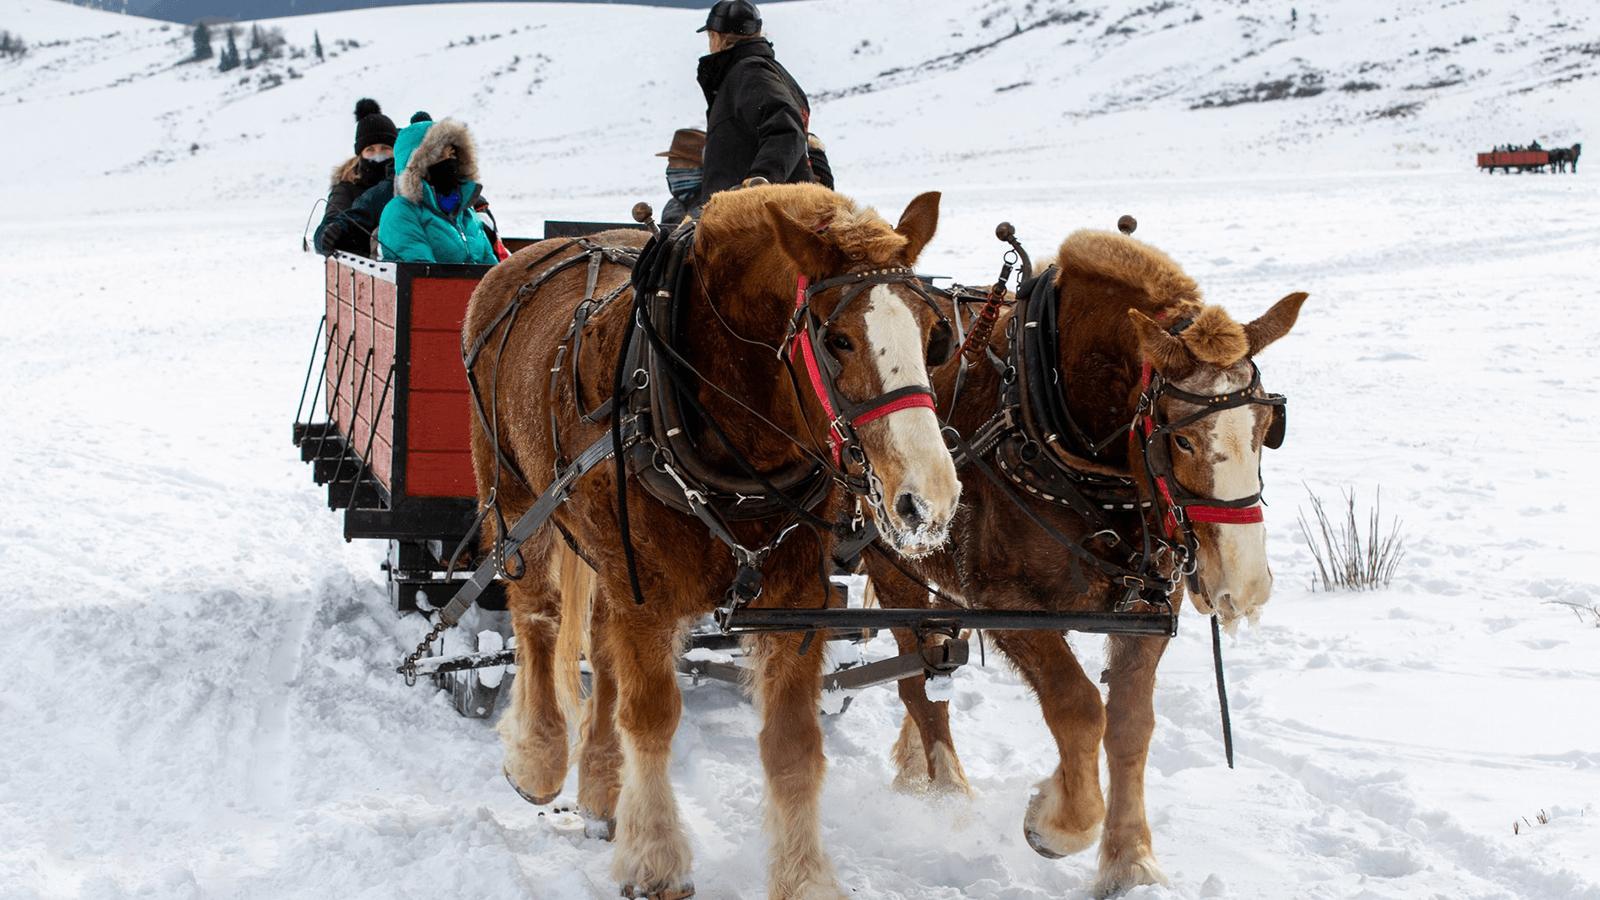 Horses pulling sleigh through the snow.